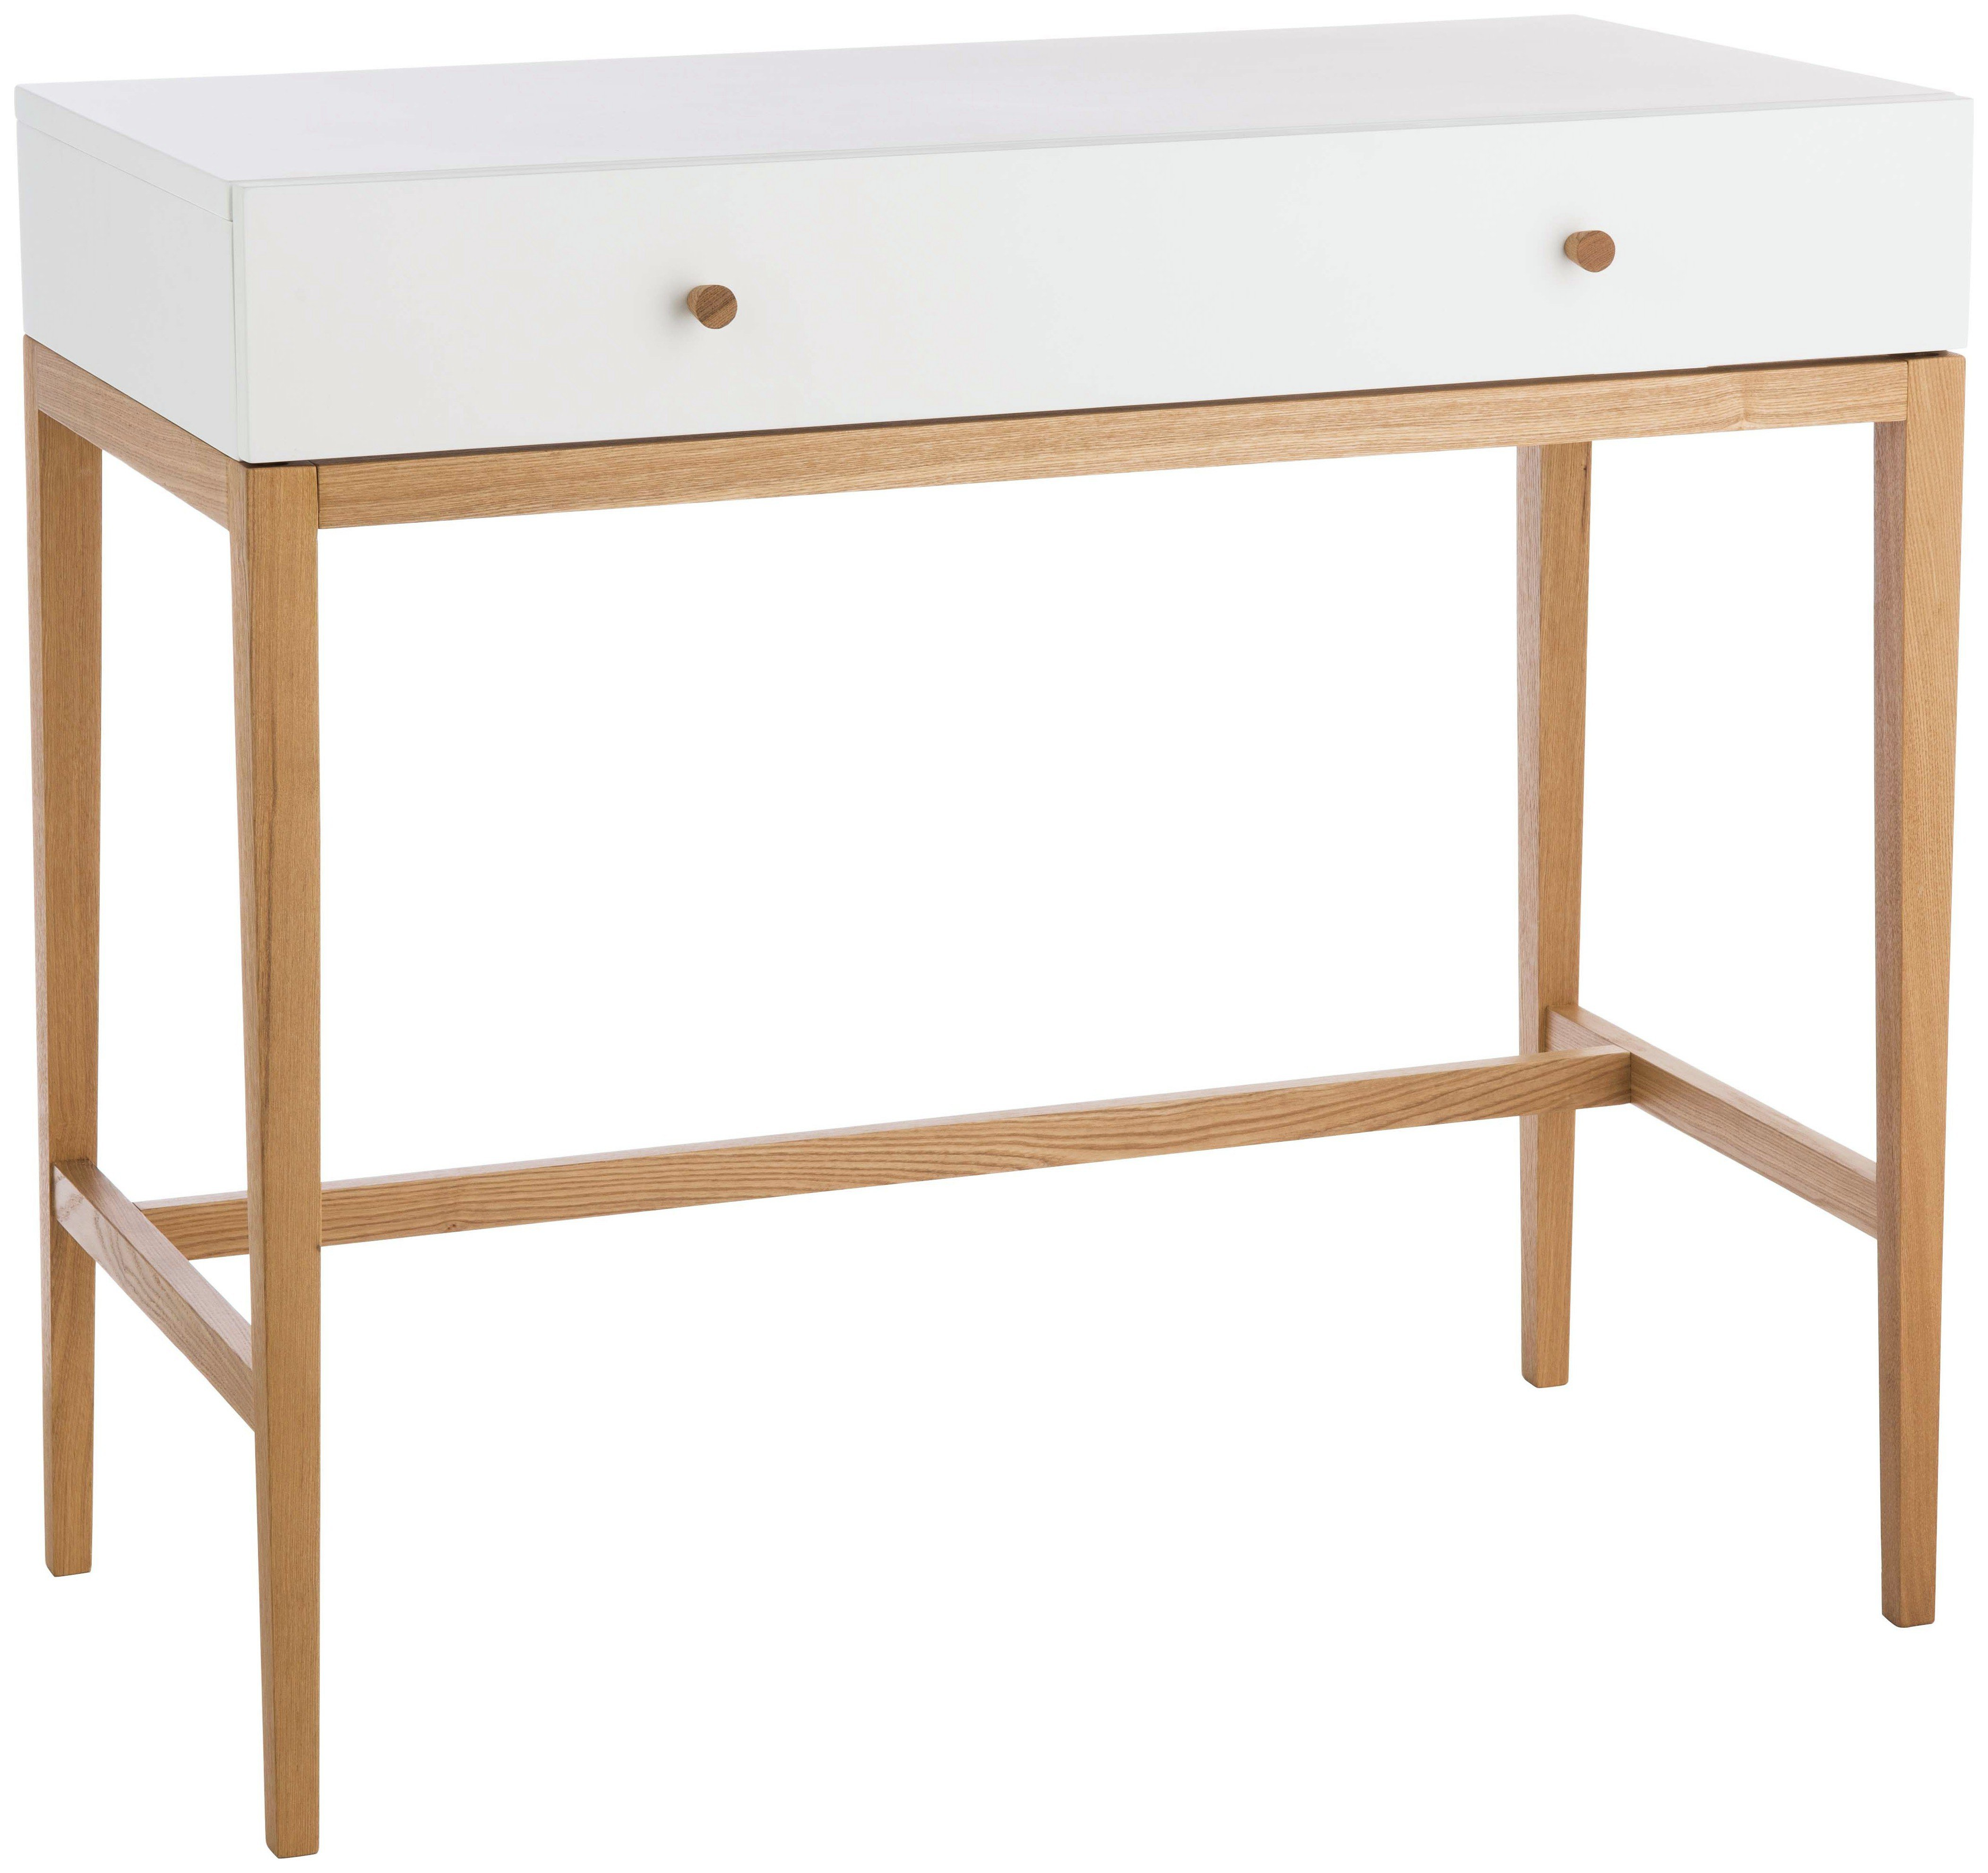 Habitat Tatsuma 1 Drawer Dressing Table - Ash & White